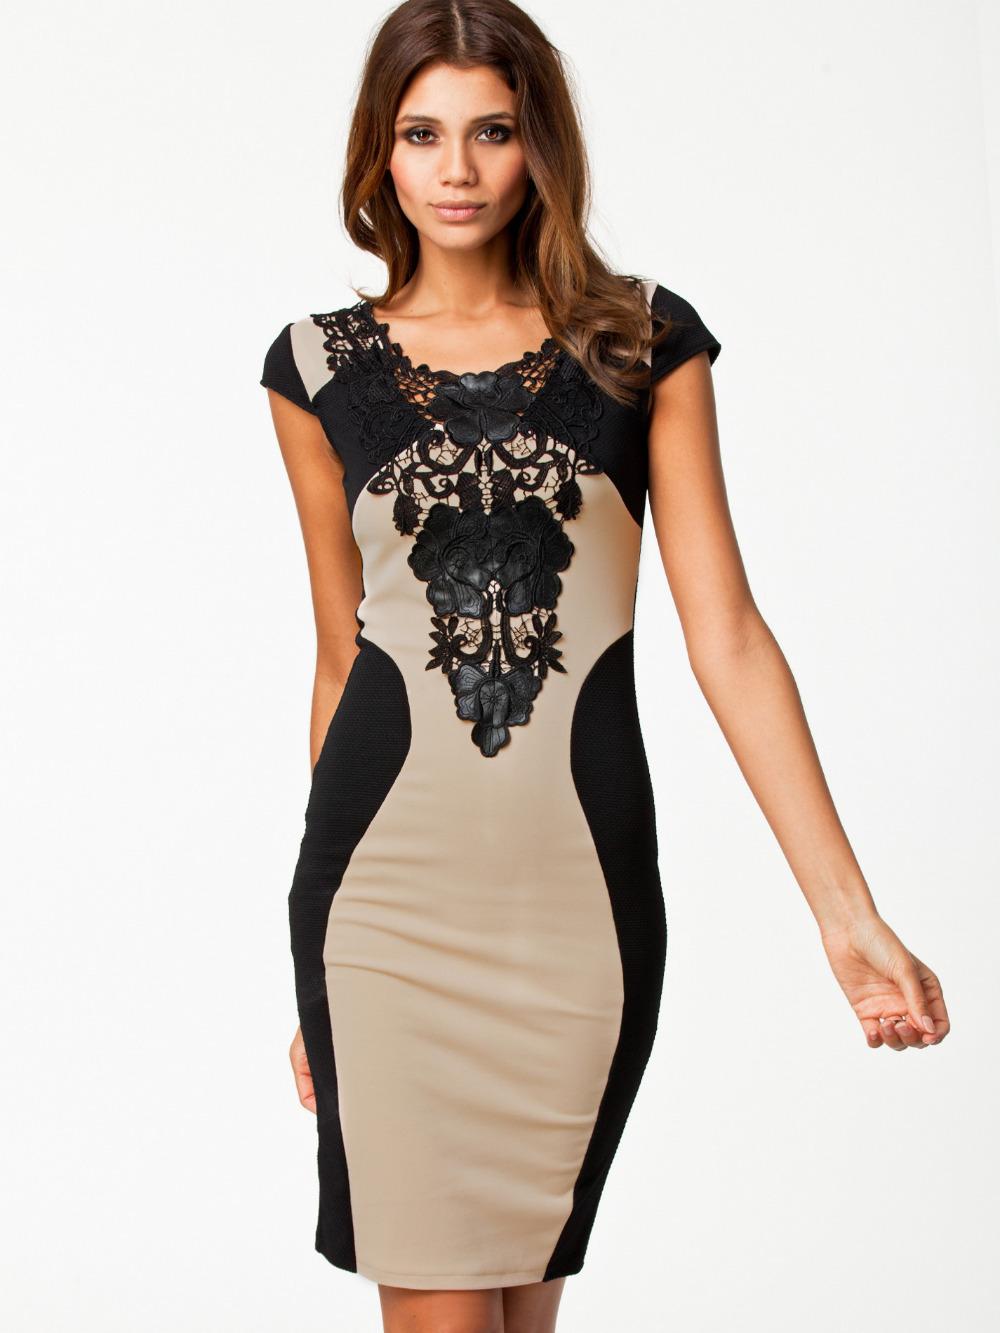 European-2014-Bandage-Dress-Women-Elegant-Bodycon-Dresses-Fashion-Patchwork-Embroidery-Dress-Autumn-Knee-Length-Bodycon.jpg